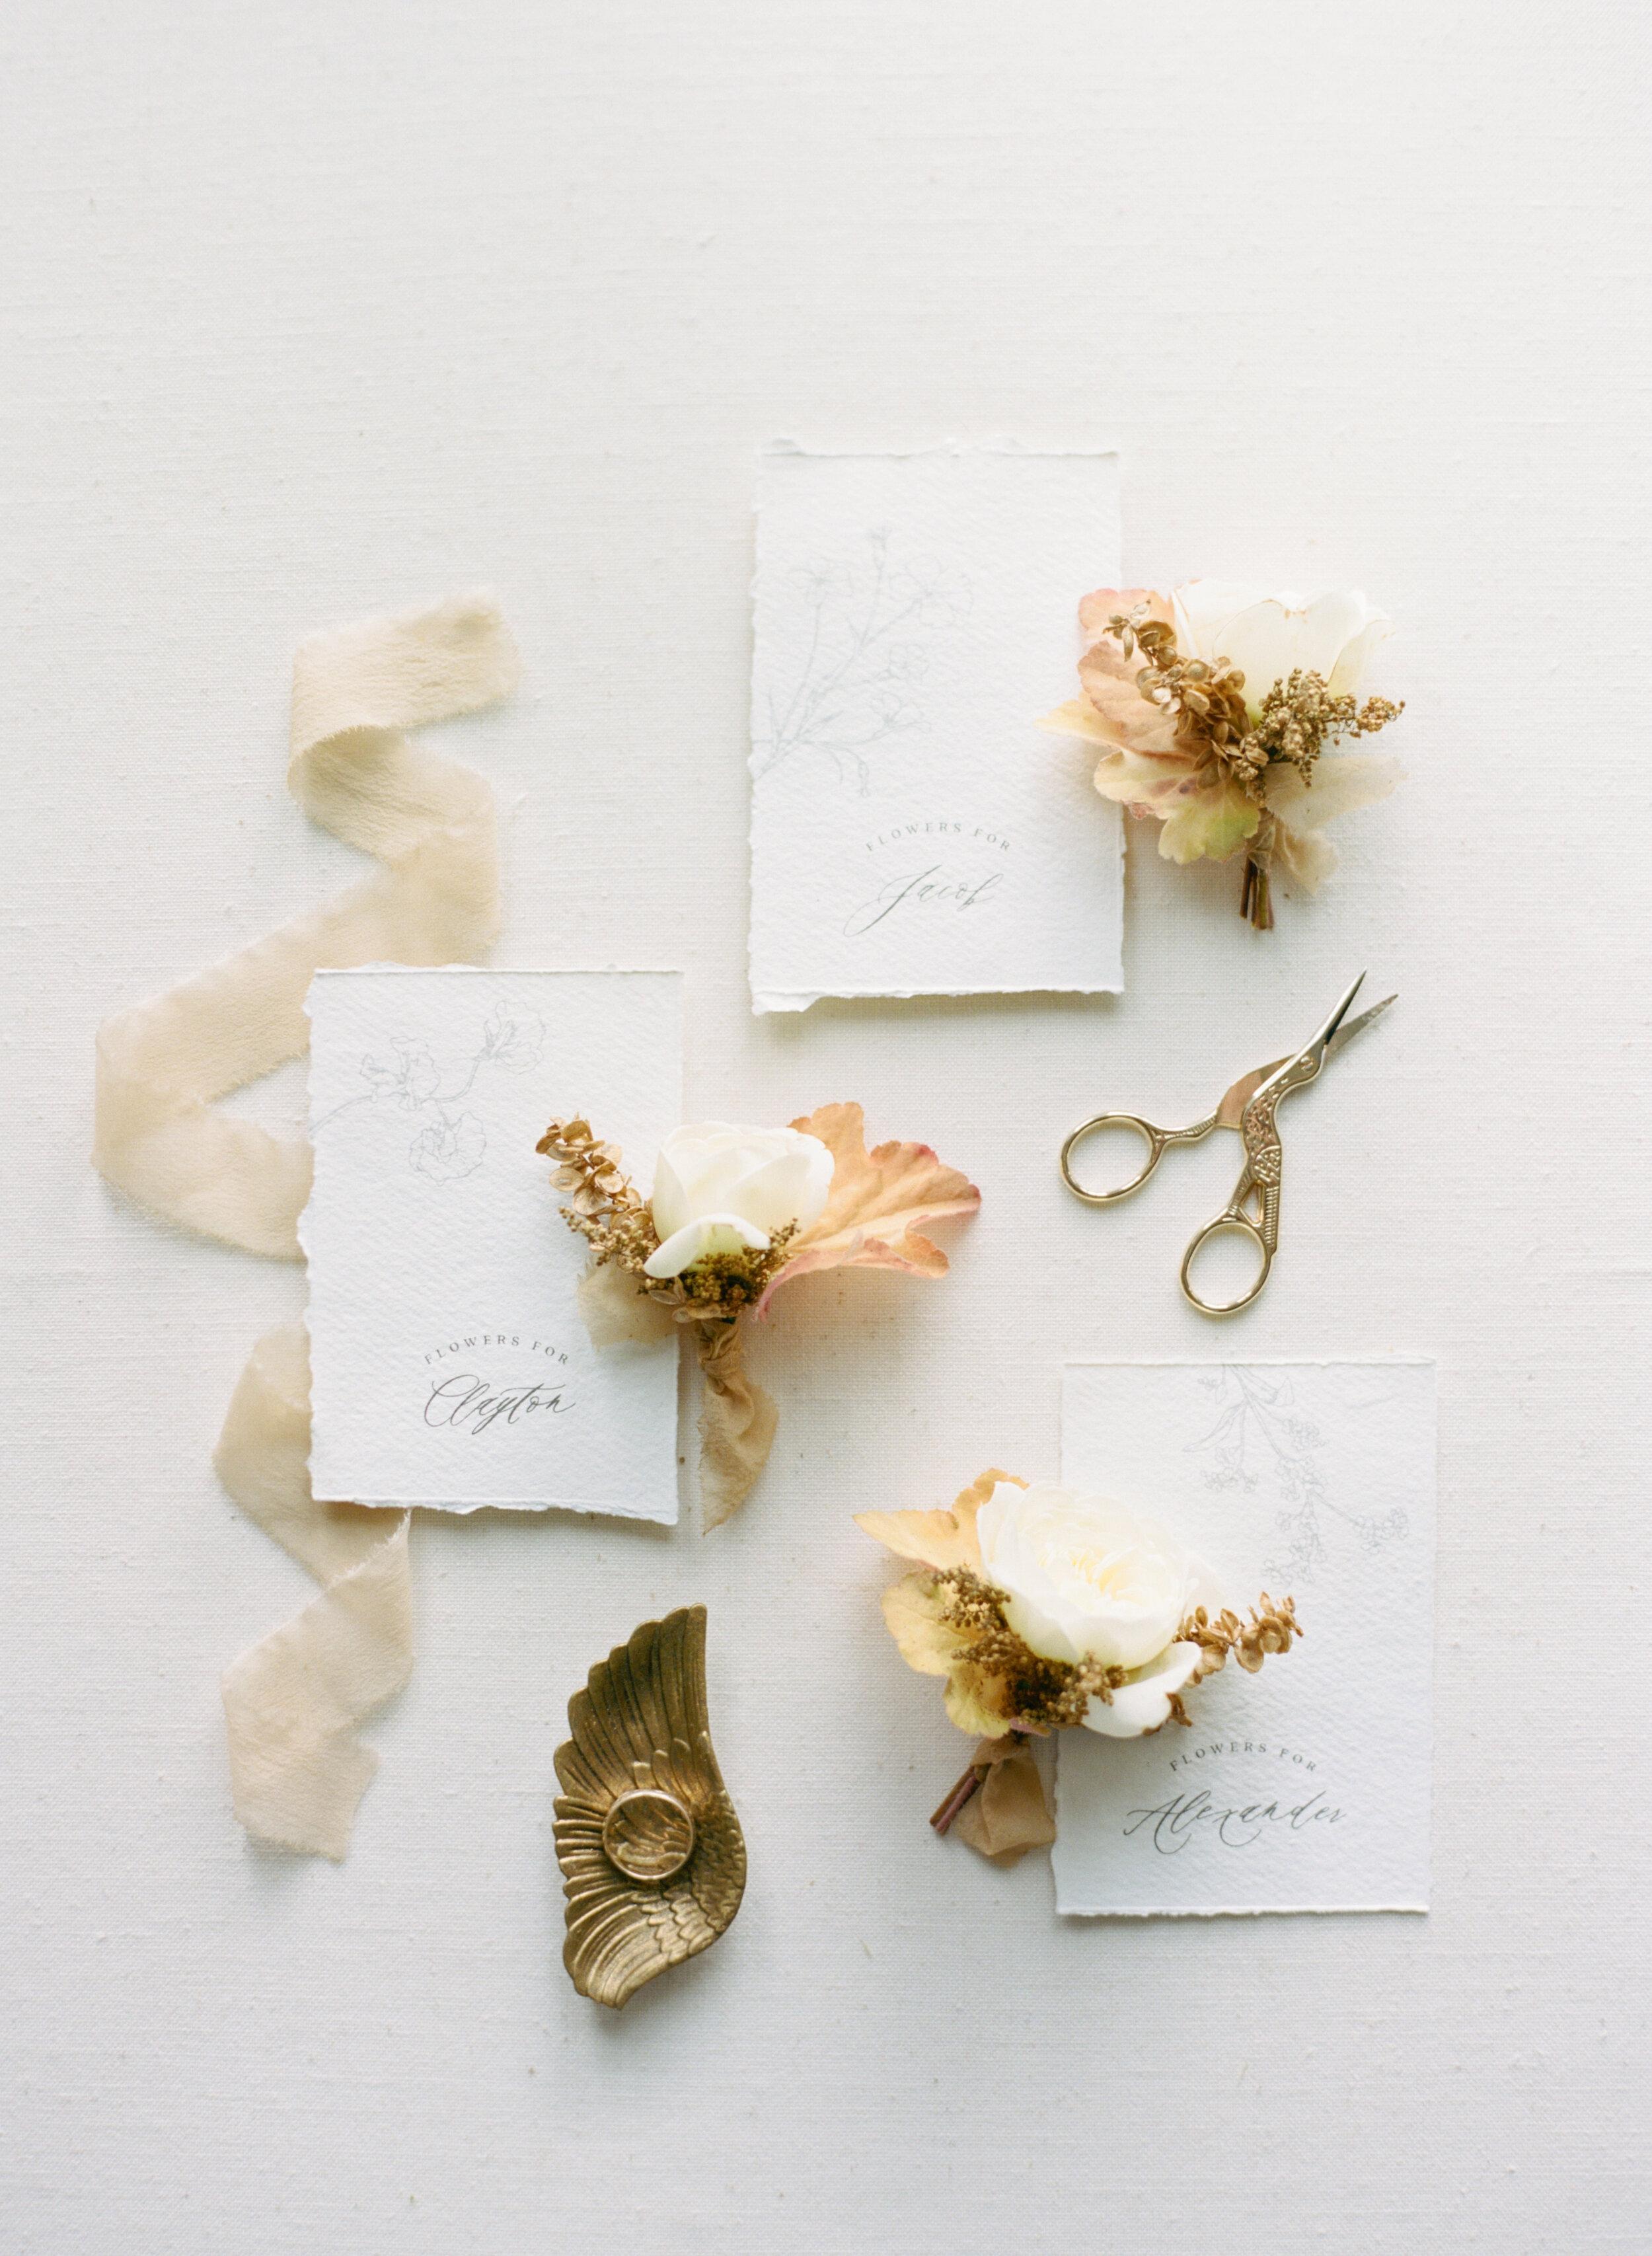 alexandra-meseke-understated-soft-luxury-wedding-upstate-ny_0010.jpg